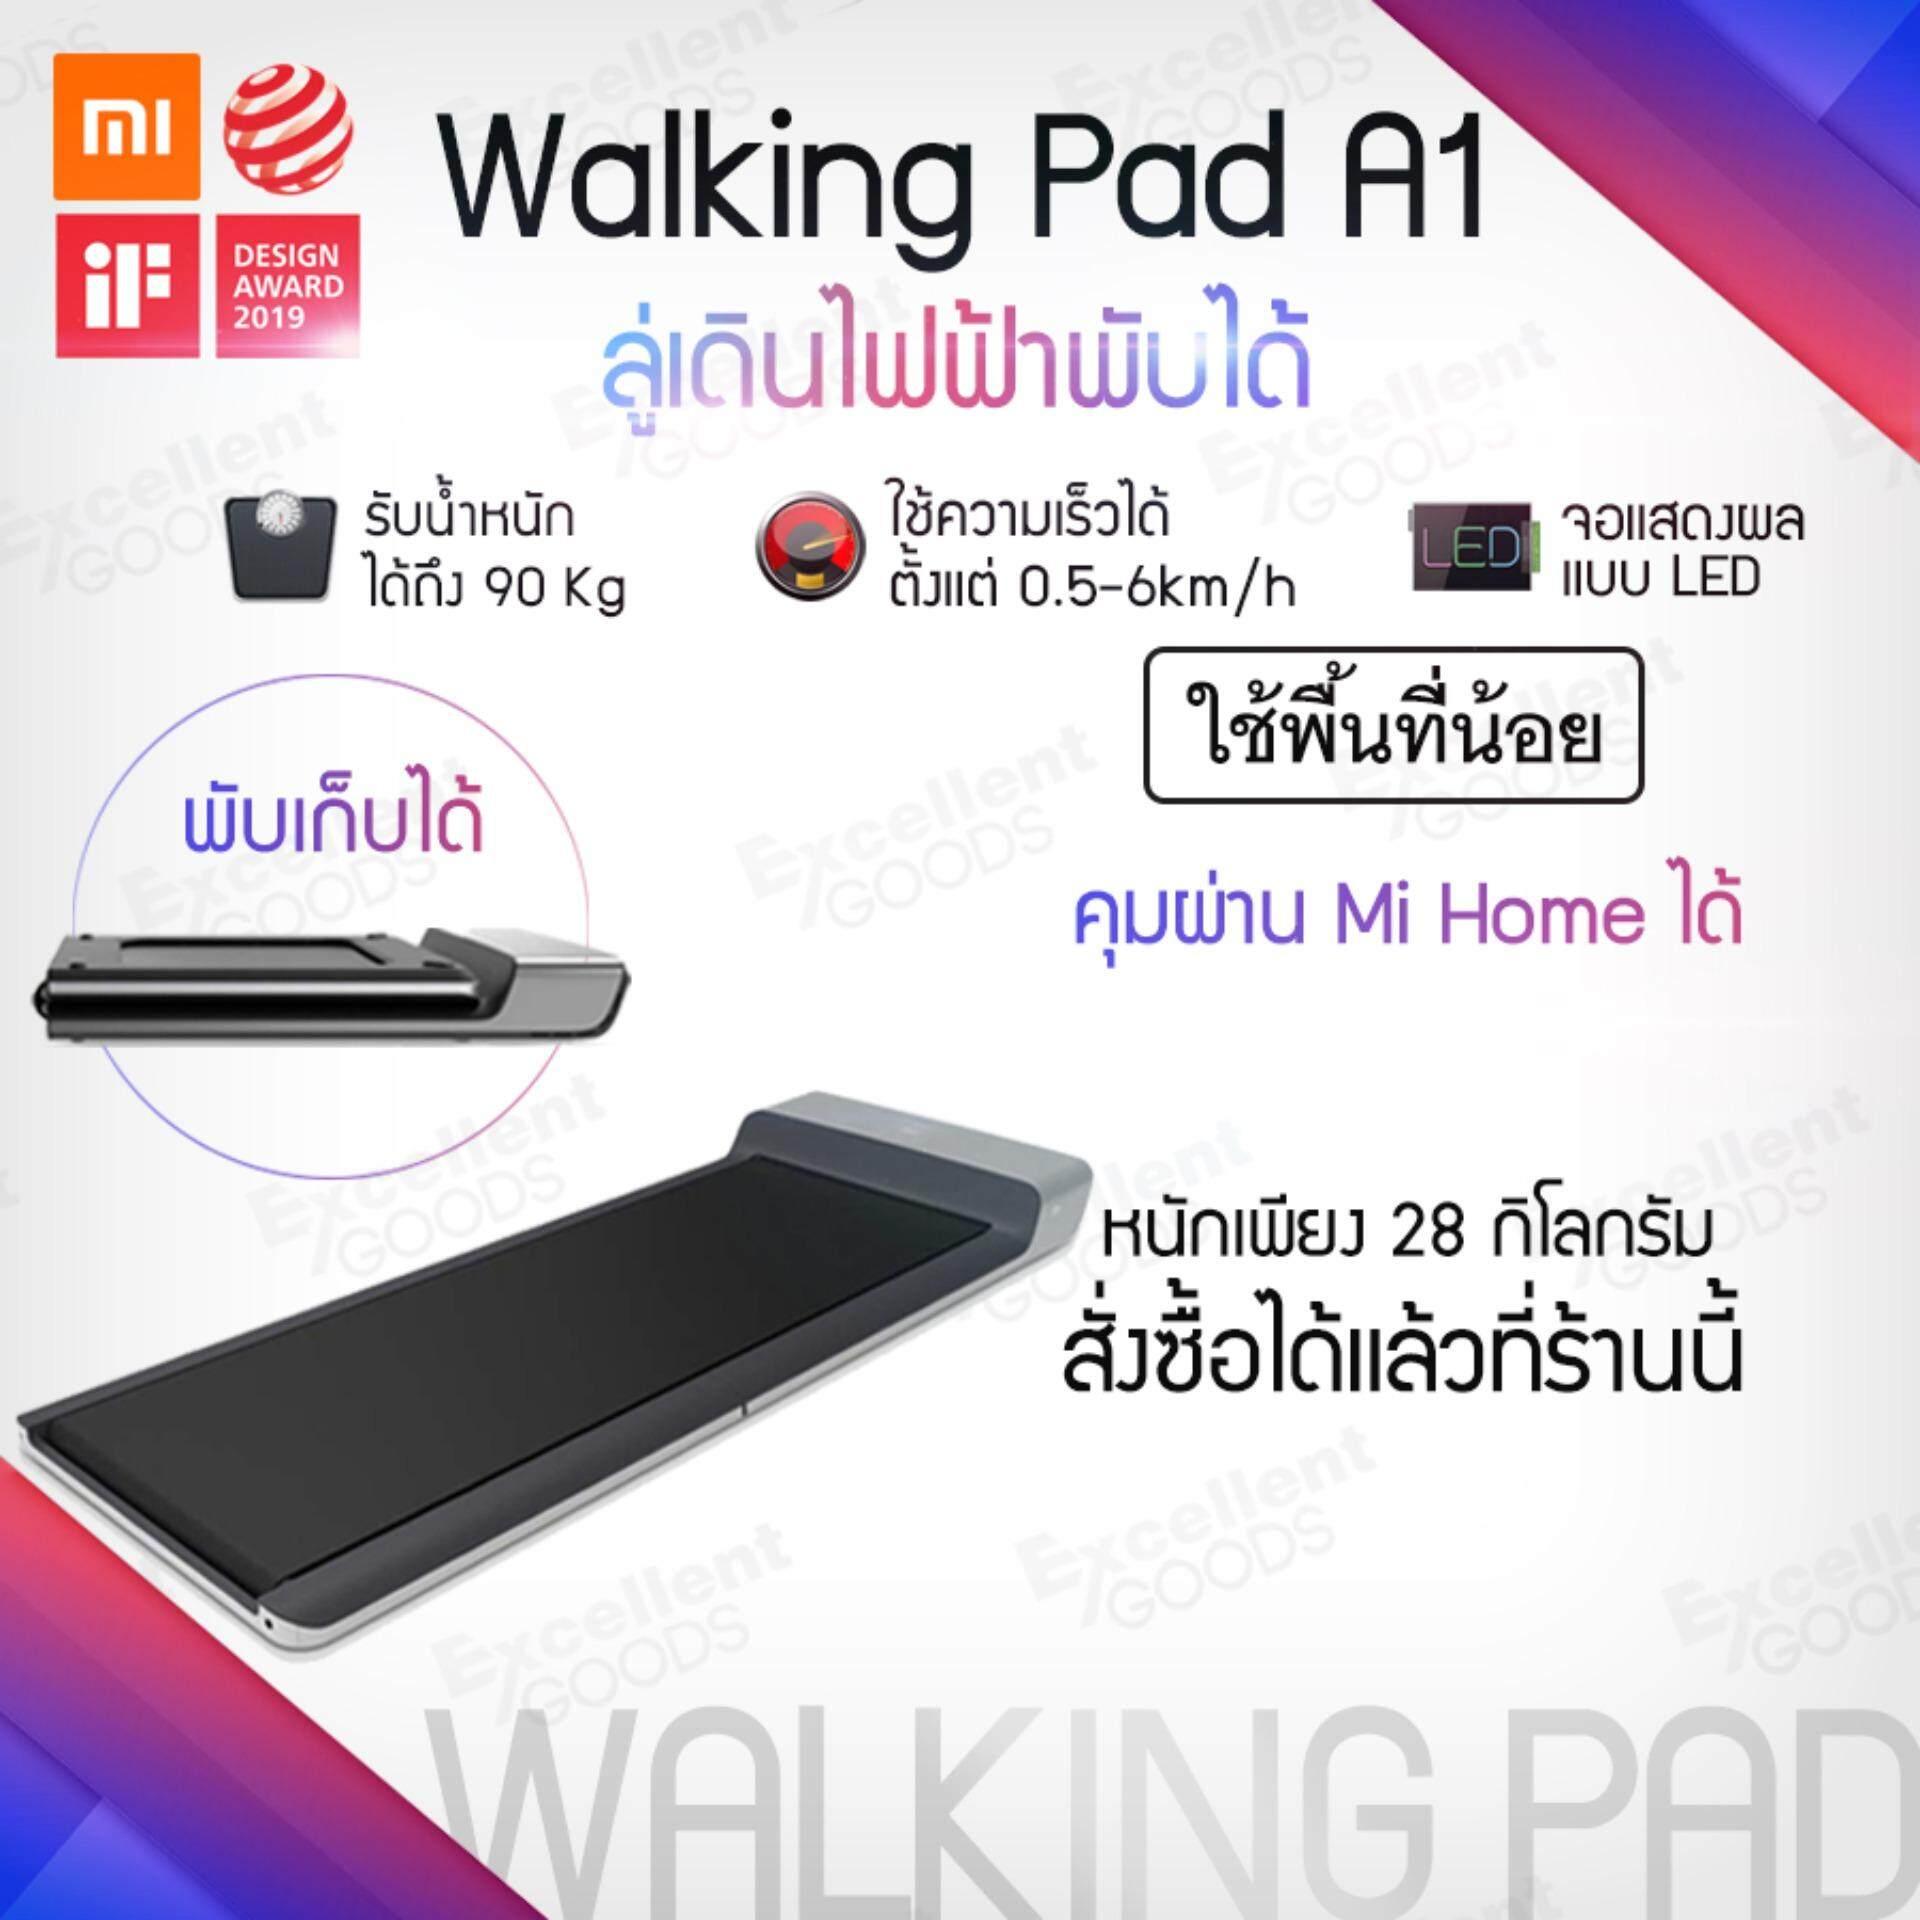 Xiaomi Mi Walking Pad A1 Motorized walking machine Smart Treadmills Running Machine WNQ Low-speed mute ลู่เดินไฟฟ้าพับได้ ควมคุมด้วย ลู่เดินพับได้ สำหรับออกำลังกาย ใช้เดินในห้อง [รีโมท / โทรศัพท์] [รับประกันร้าน 1 เดือน]